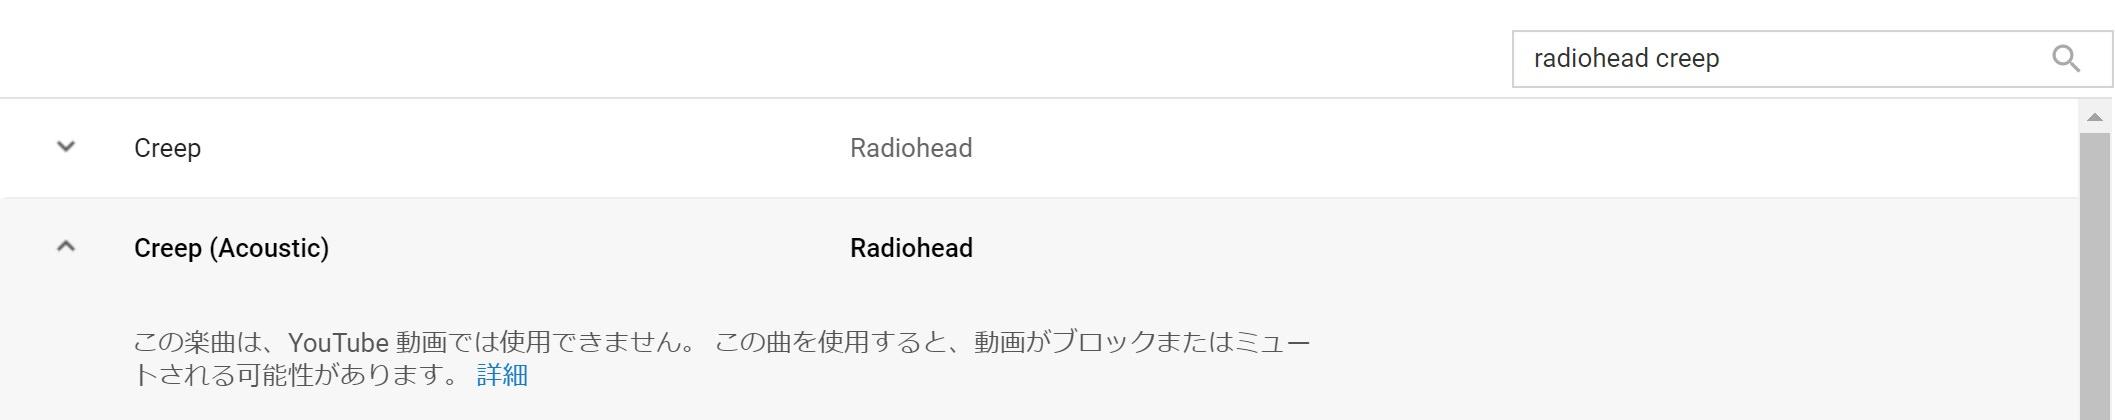 RadioheadのCreep